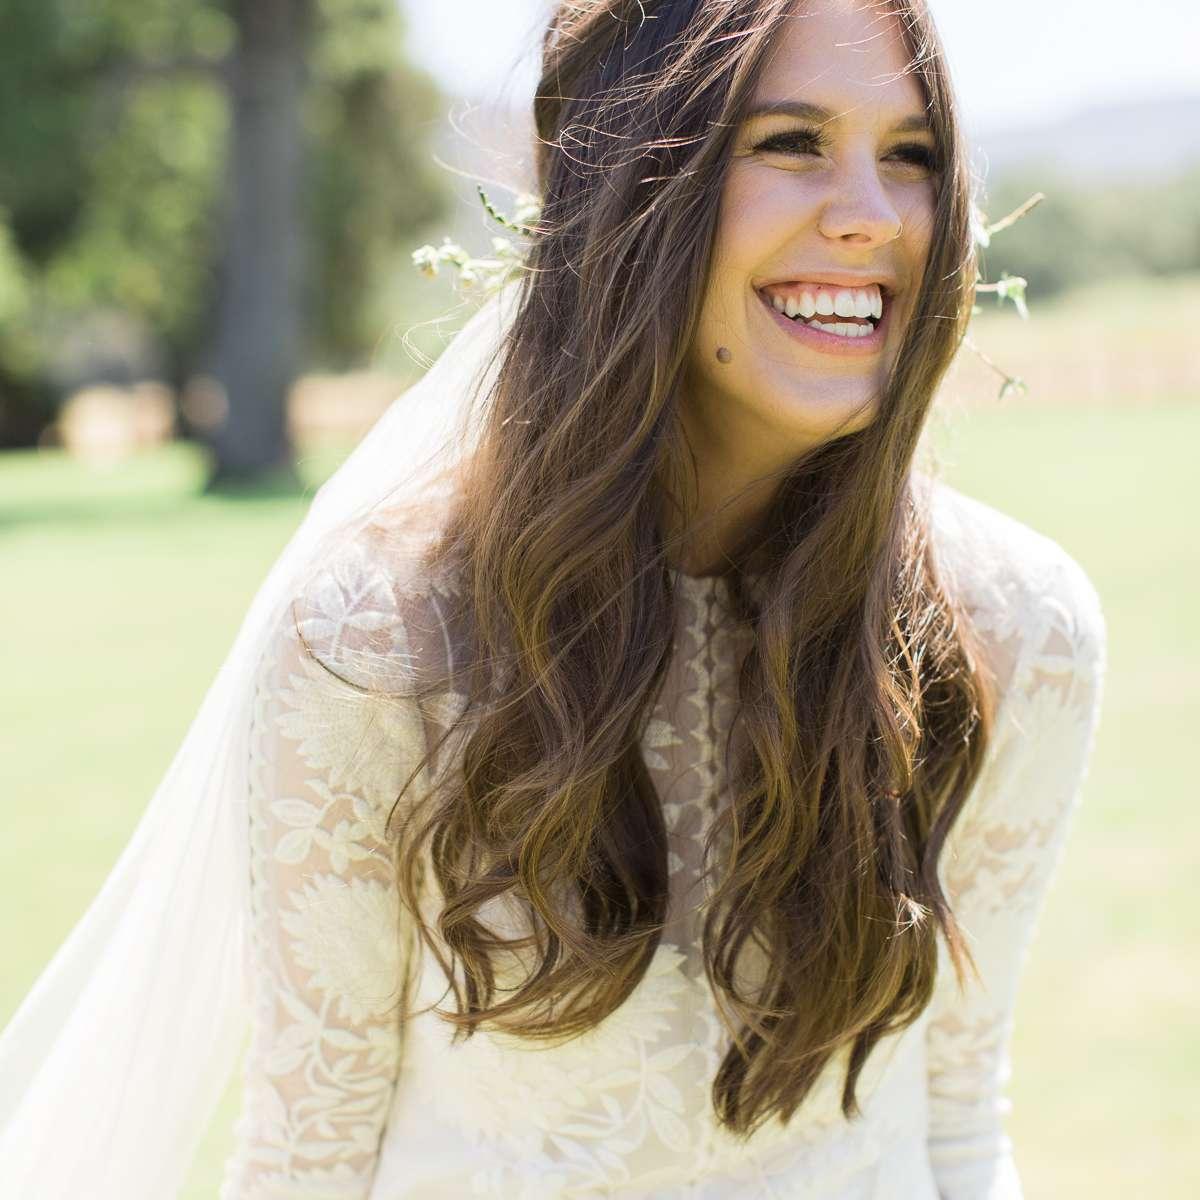 <p>Bride close up shot smiling</p><br><br>